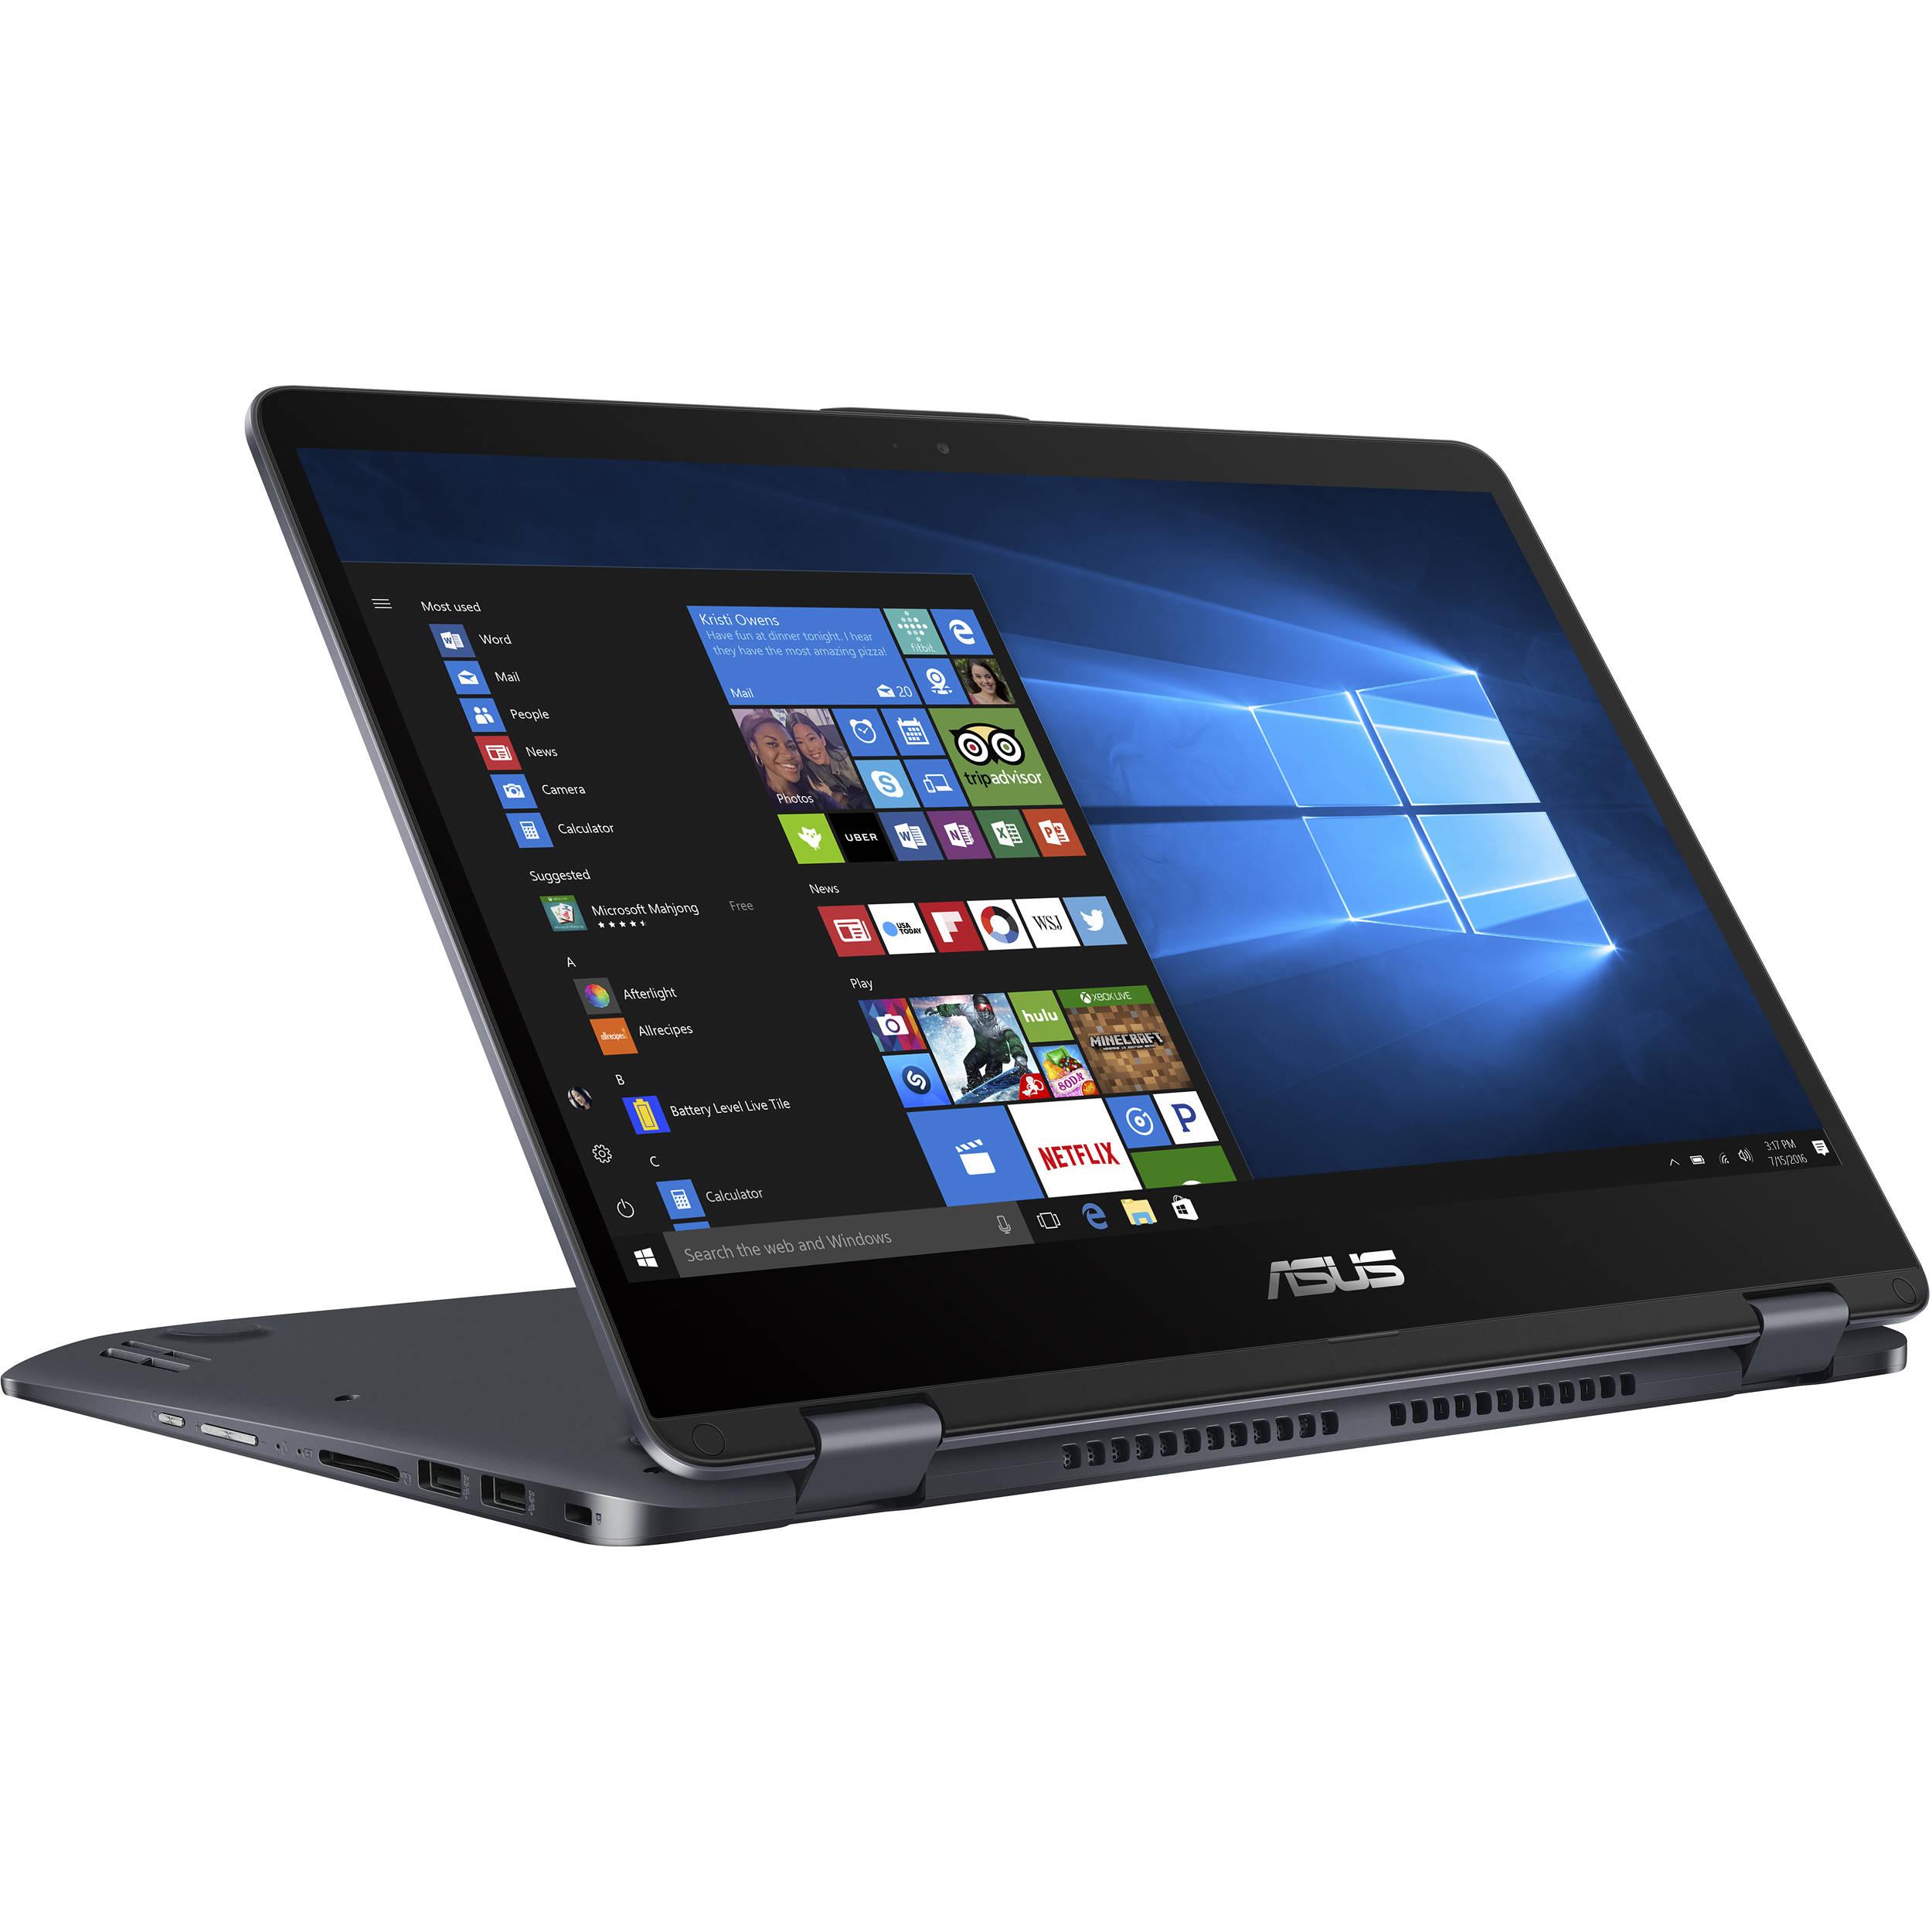 Compare Lenovo 15 6 Thinkpad E570 Series Laptop Vs Asus 15 6 R